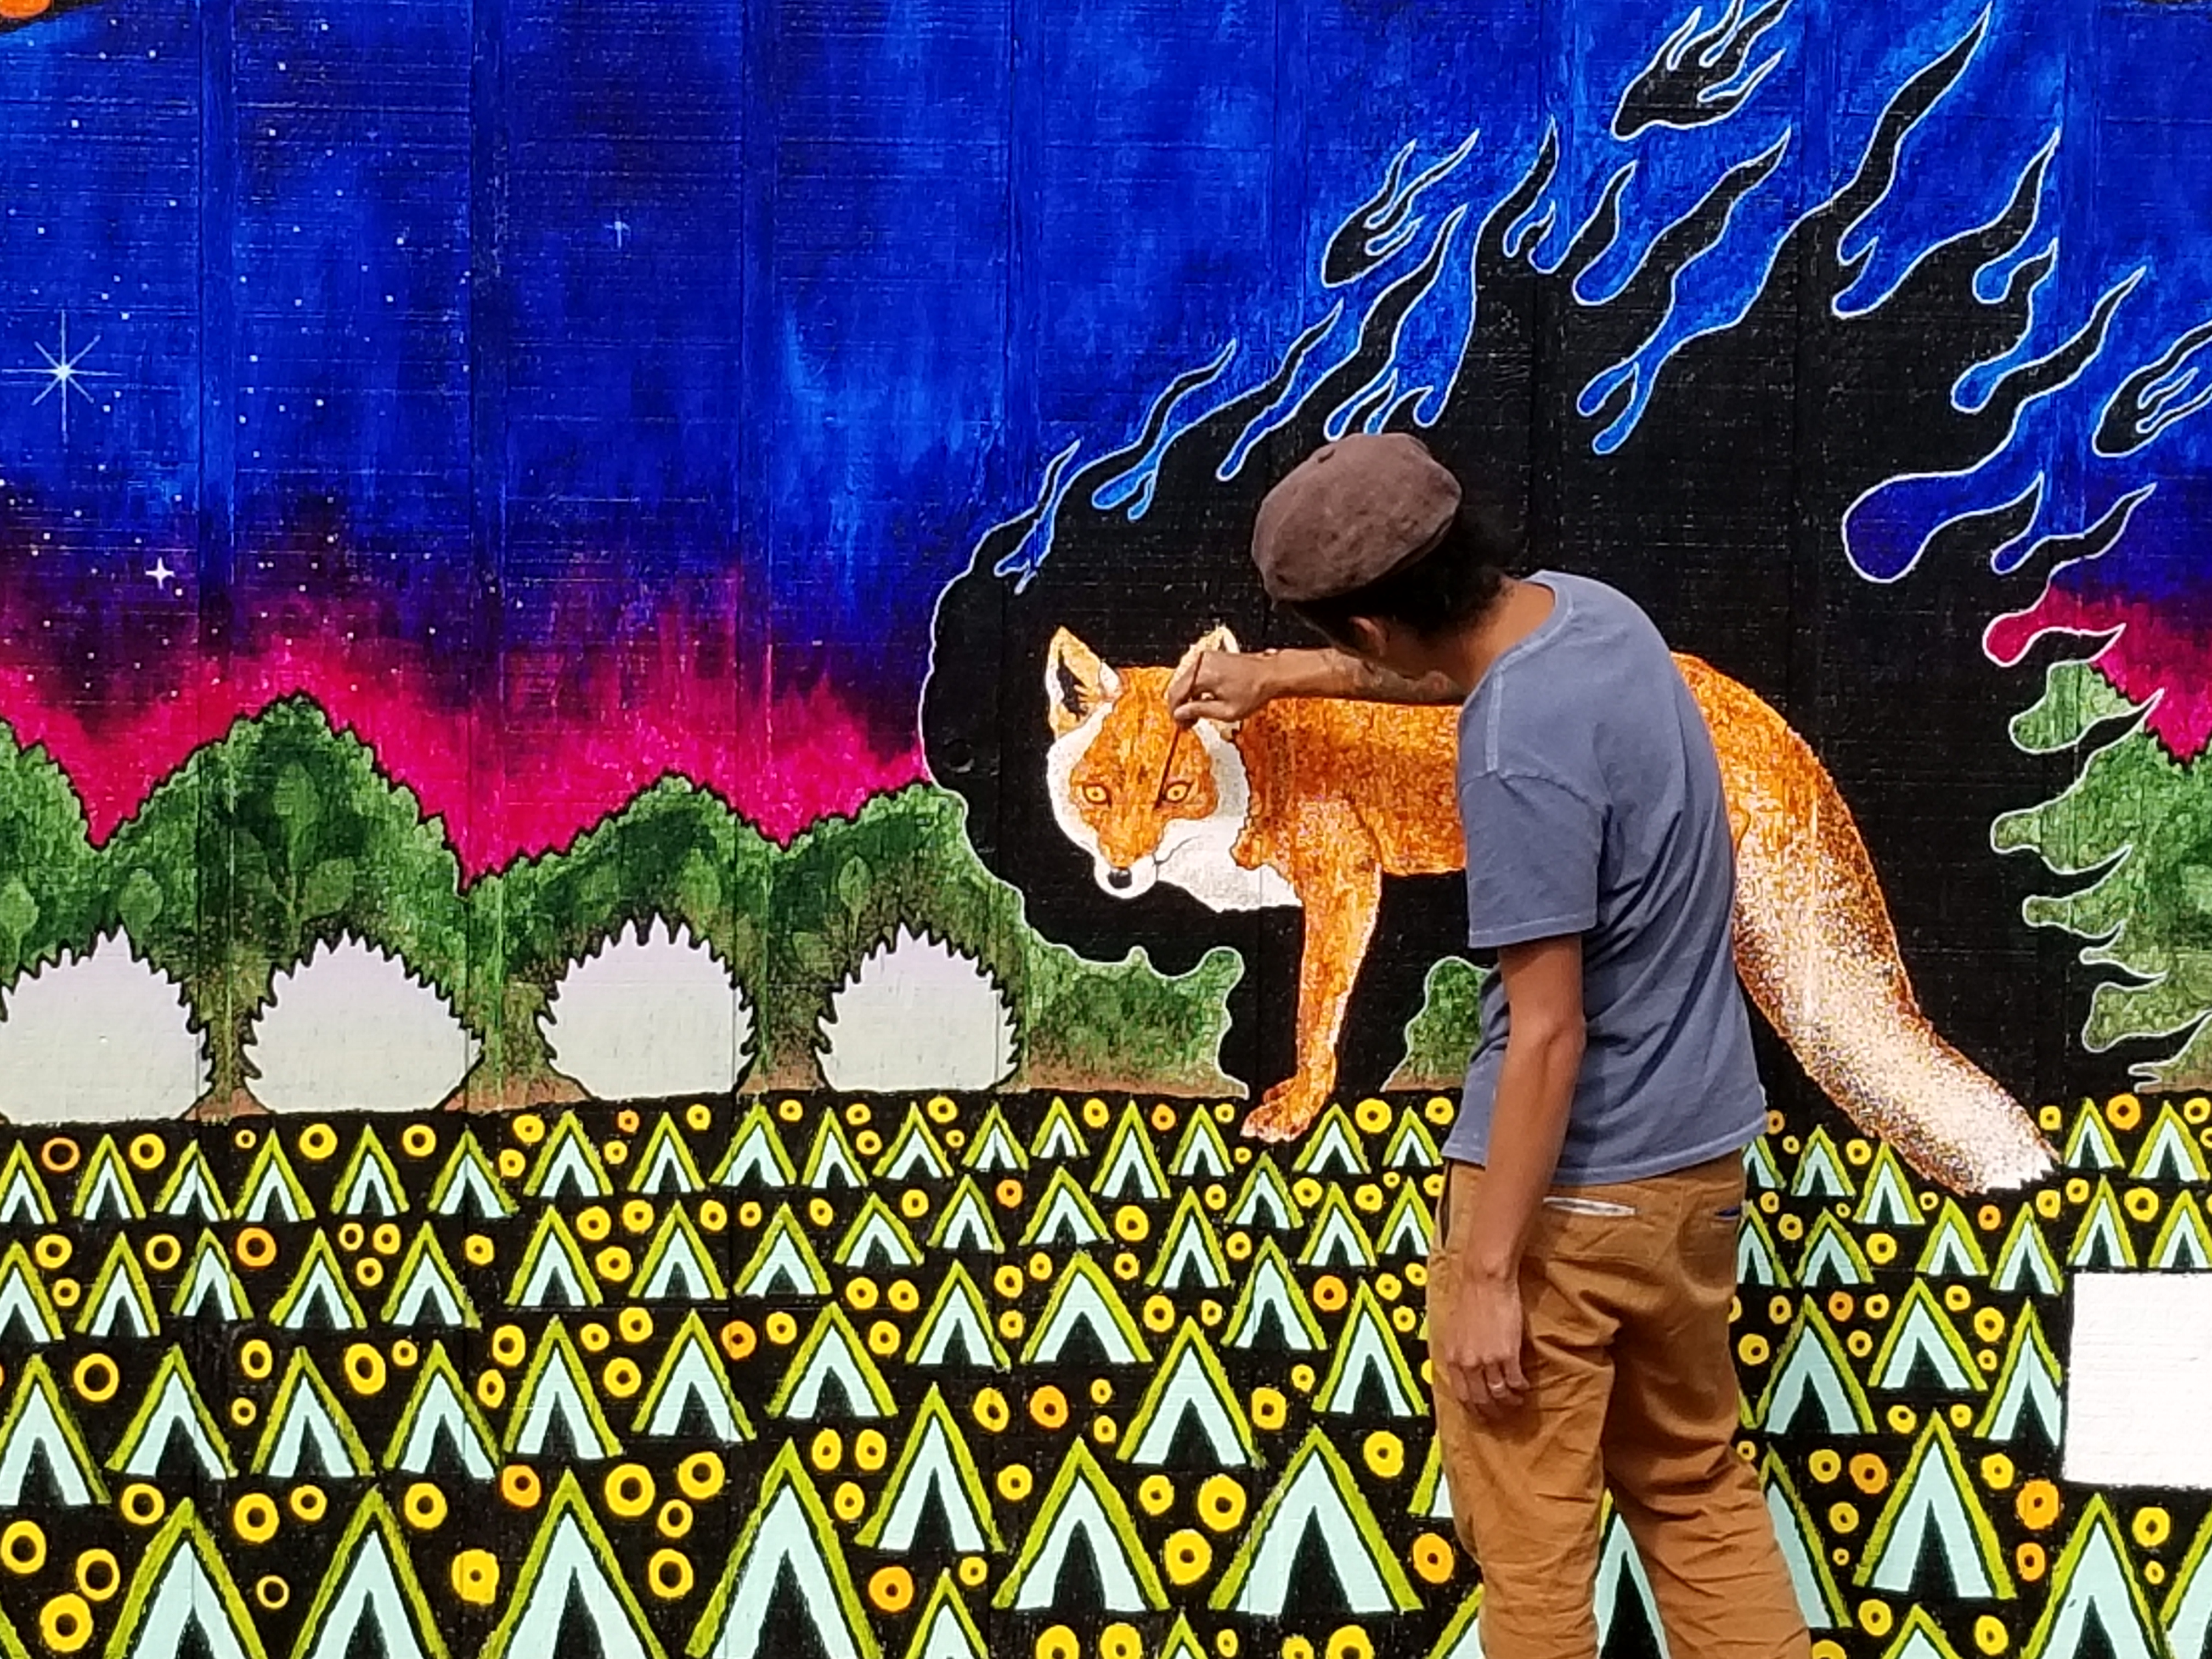 Mural by Chris Huang